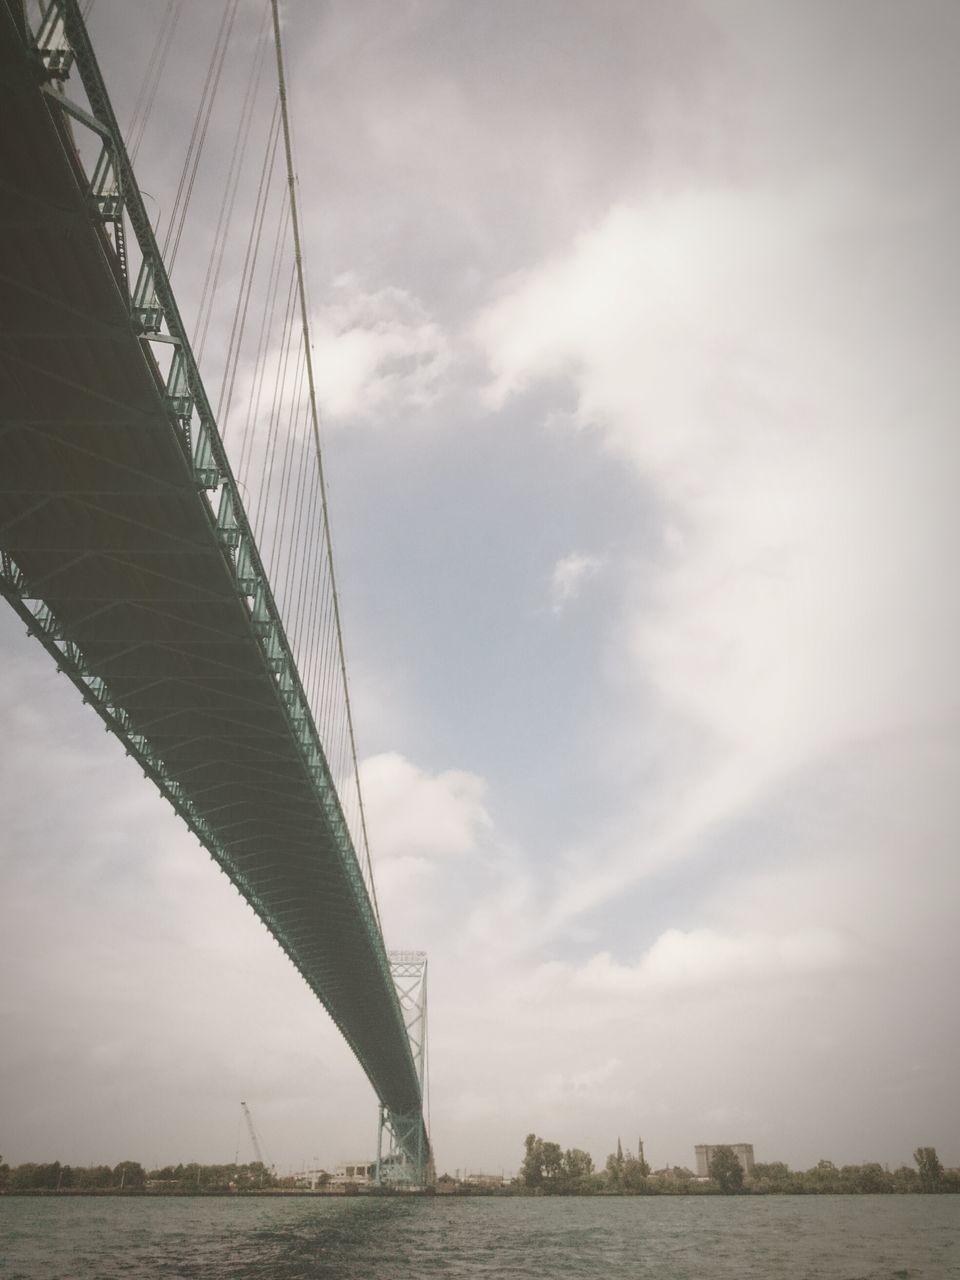 bridge - man made structure, connection, suspension bridge, engineering, architecture, sky, built structure, transportation, outdoors, no people, cloud - sky, travel destinations, day, bridge, water, city